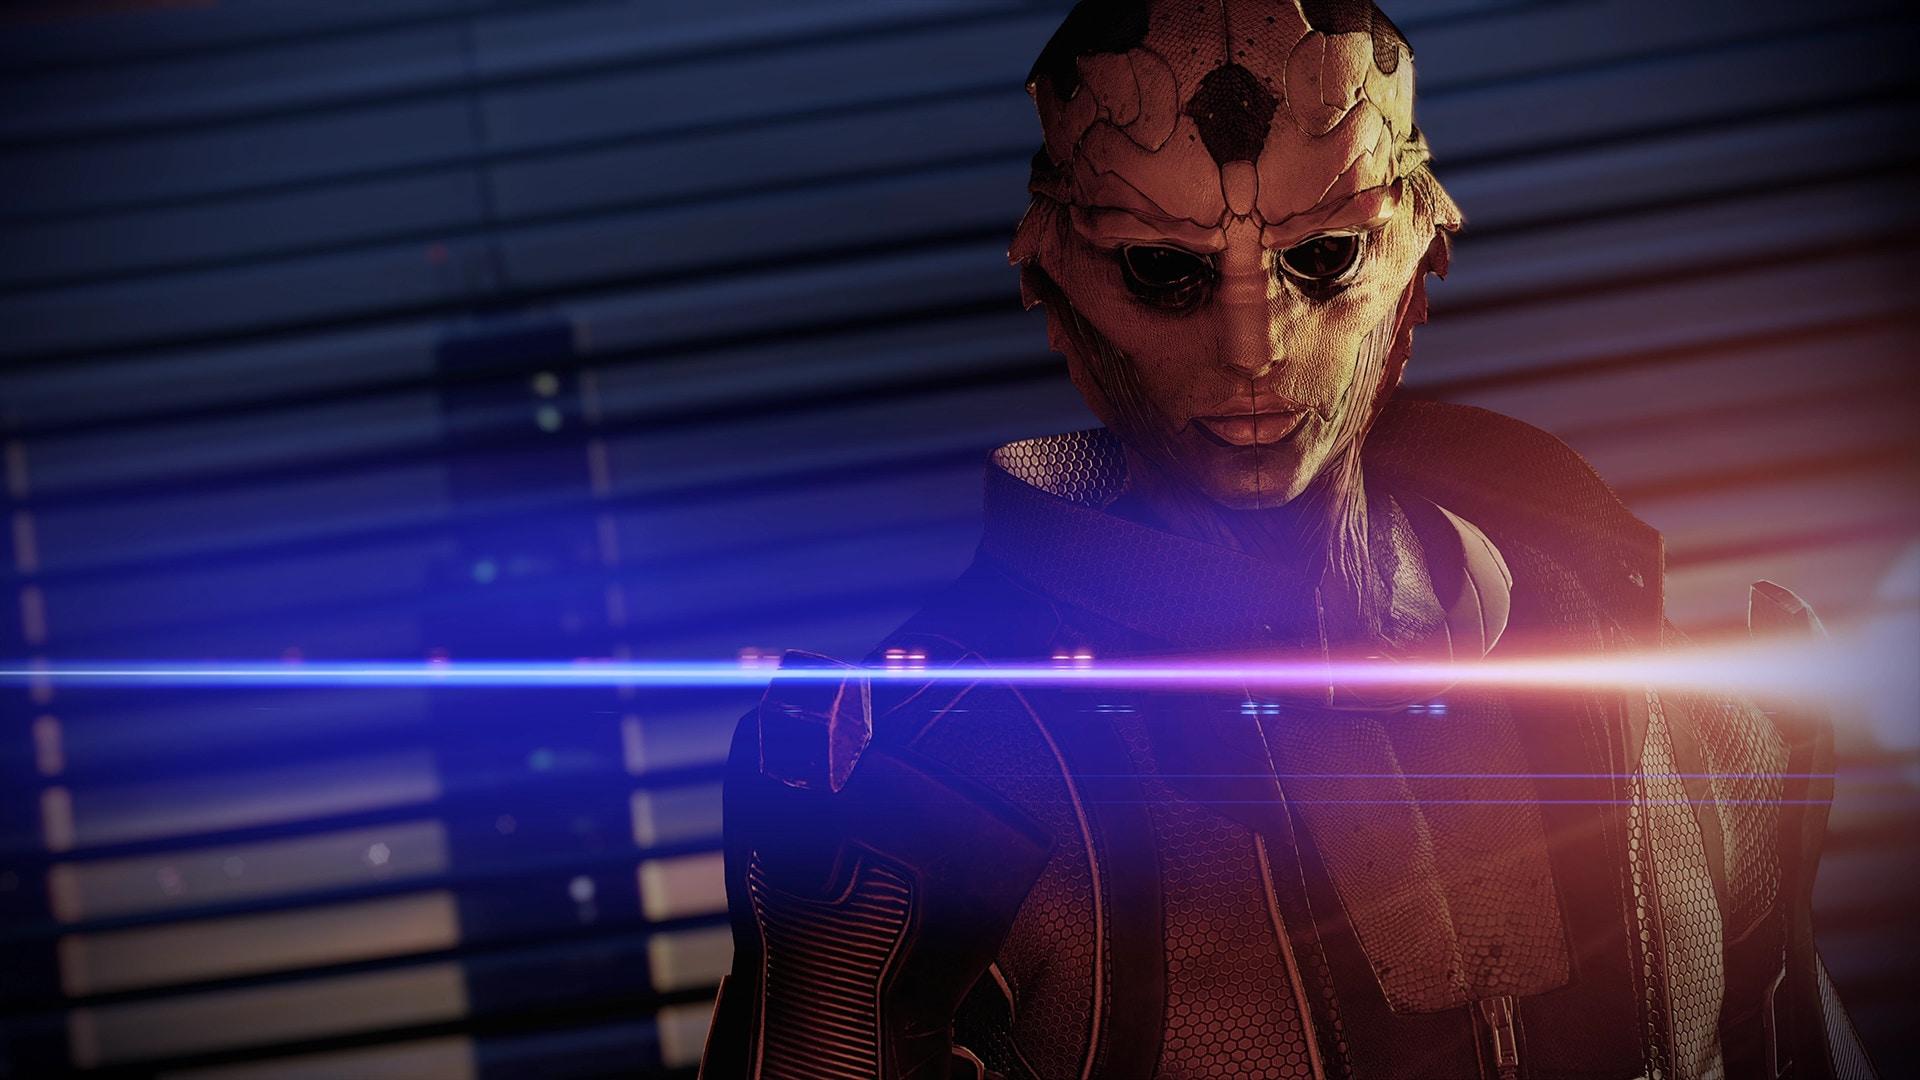 Mass Effect Legendary Edition (PC) - Origin Key - GLOBAL (EN/PL/RU) - 4